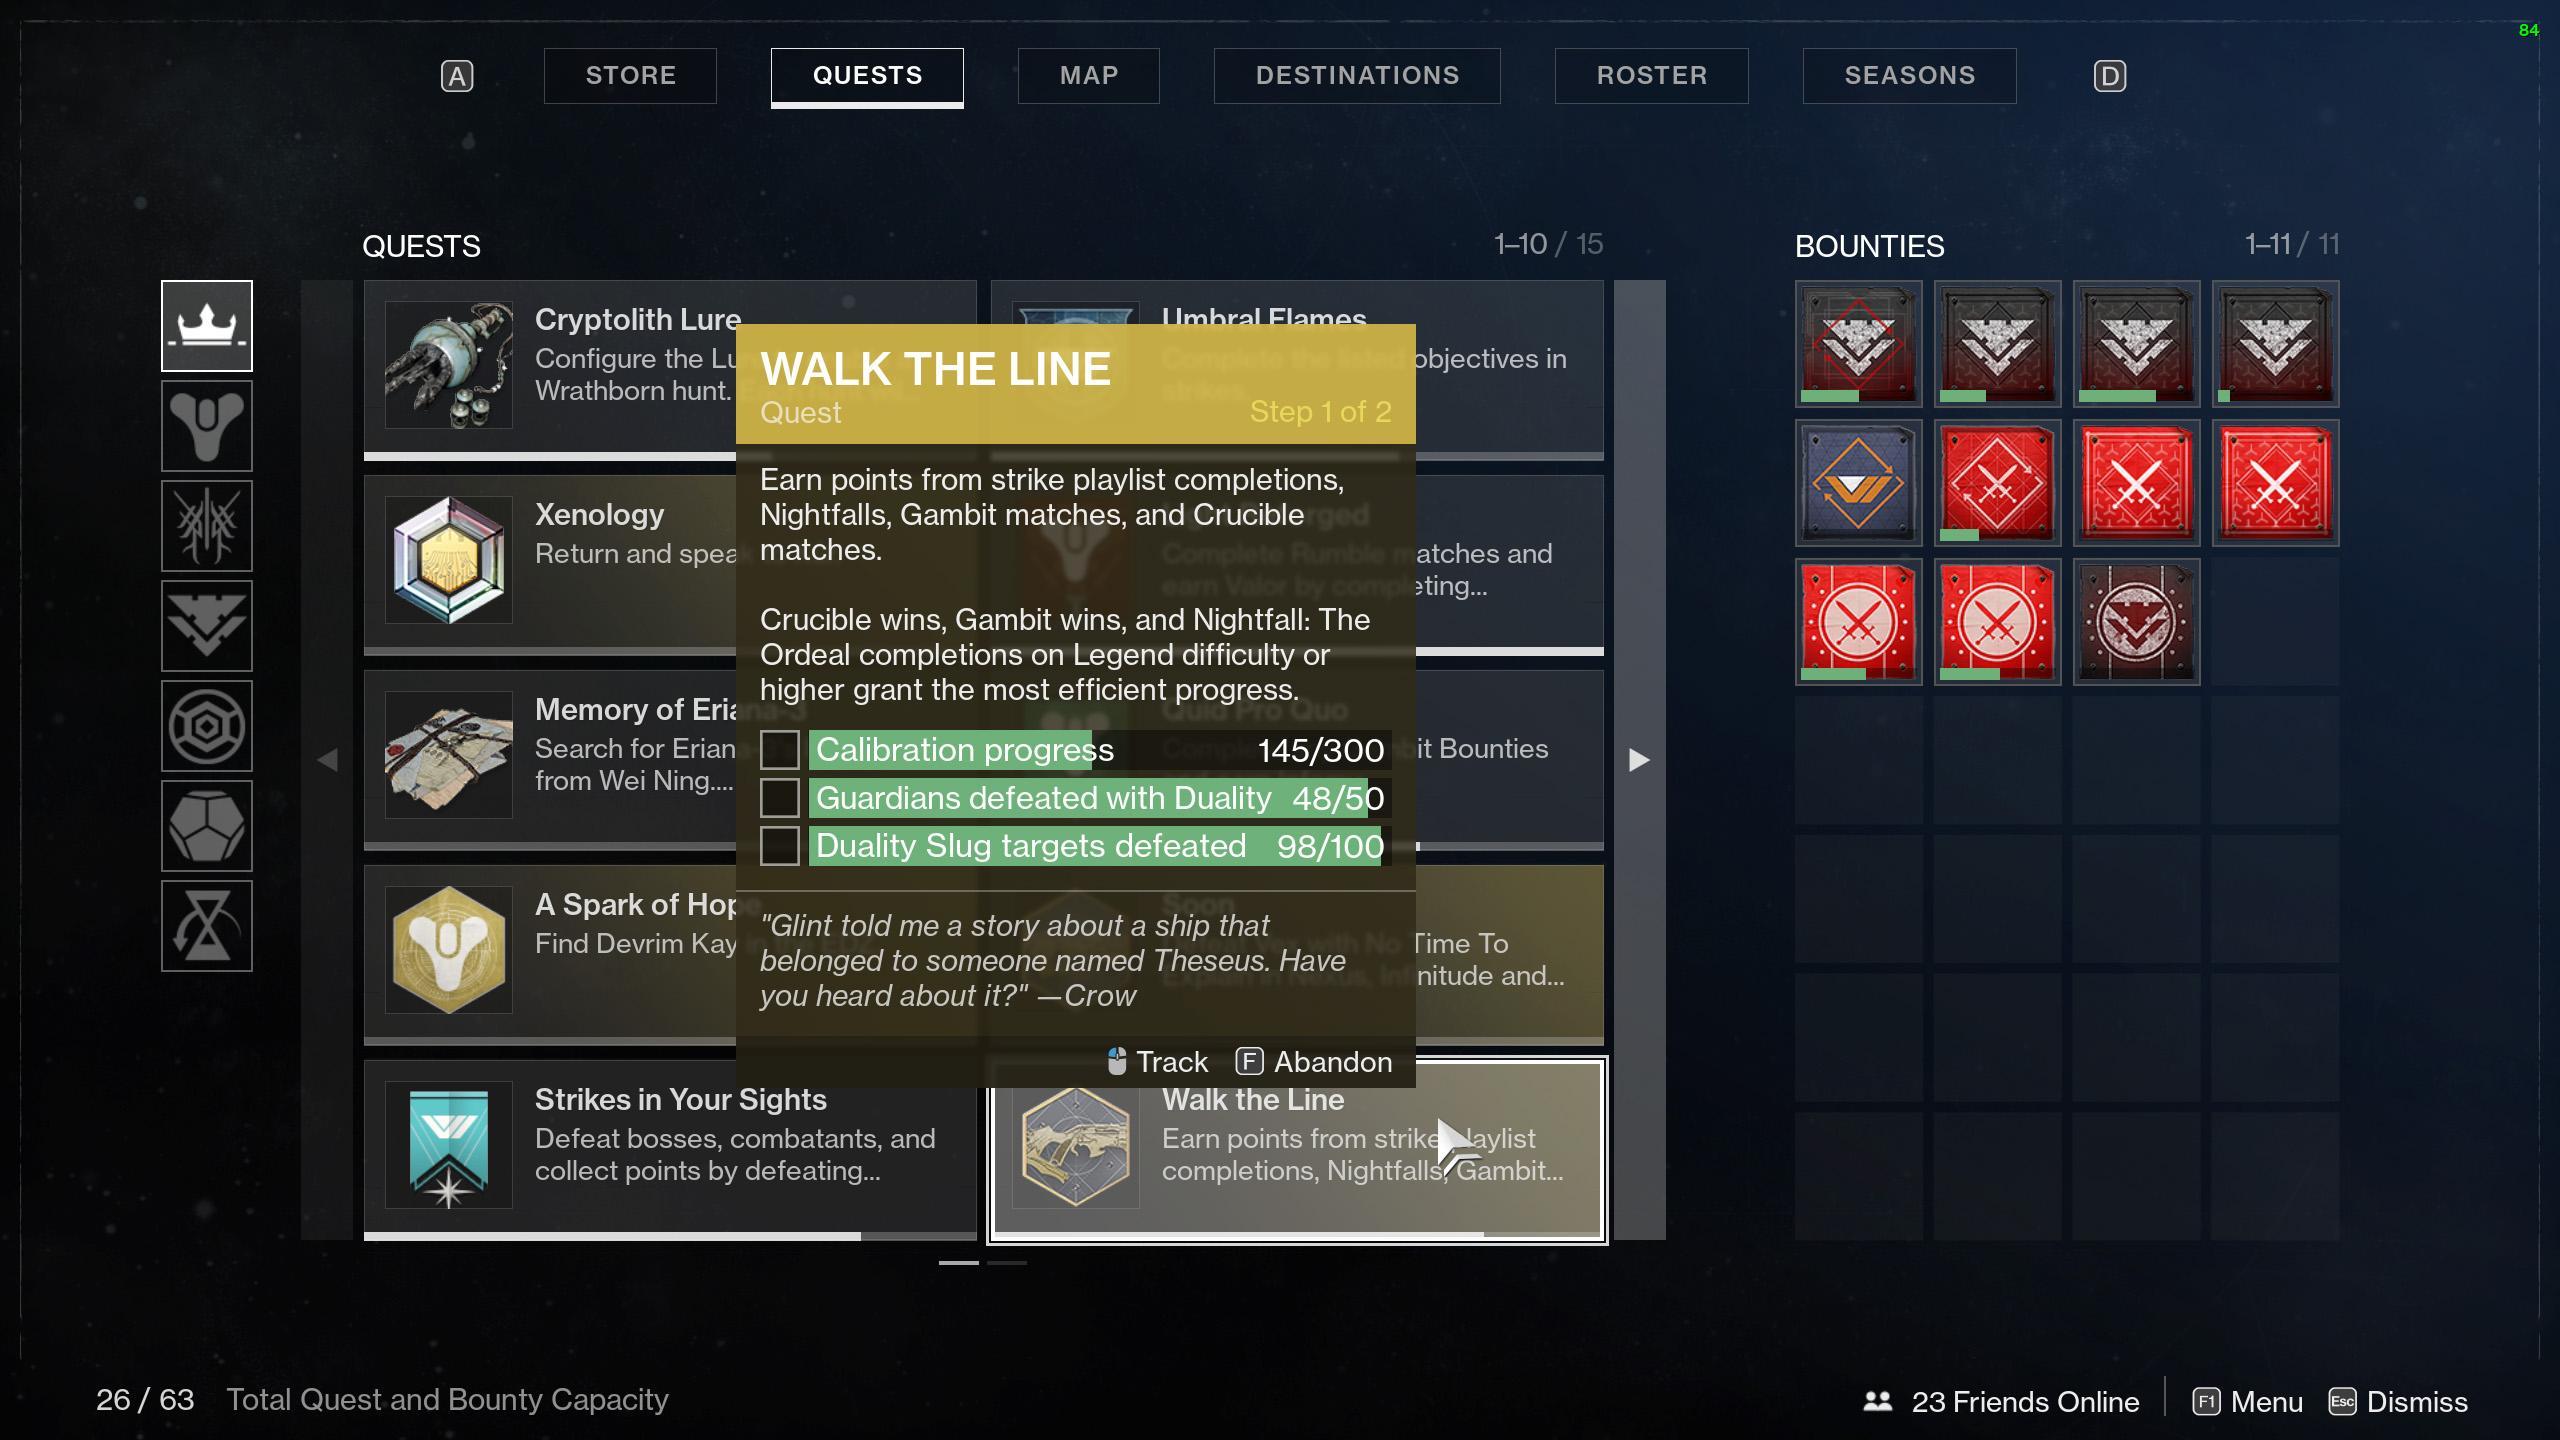 Destiny 2 Walk the Line